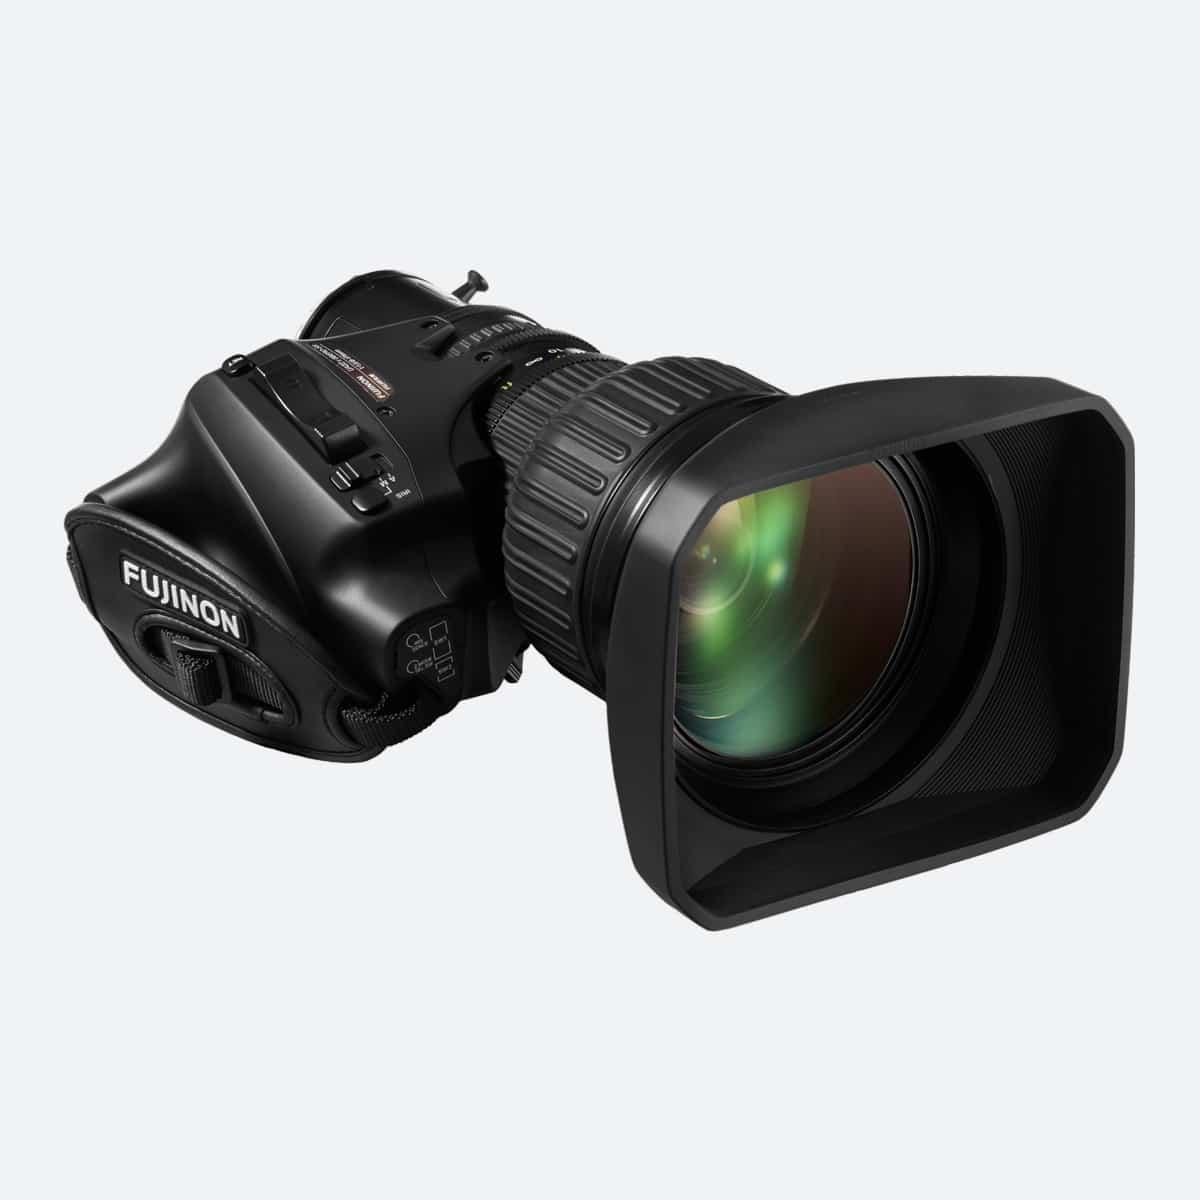 Fujinon UA22 x 8 BERD 4K Lens